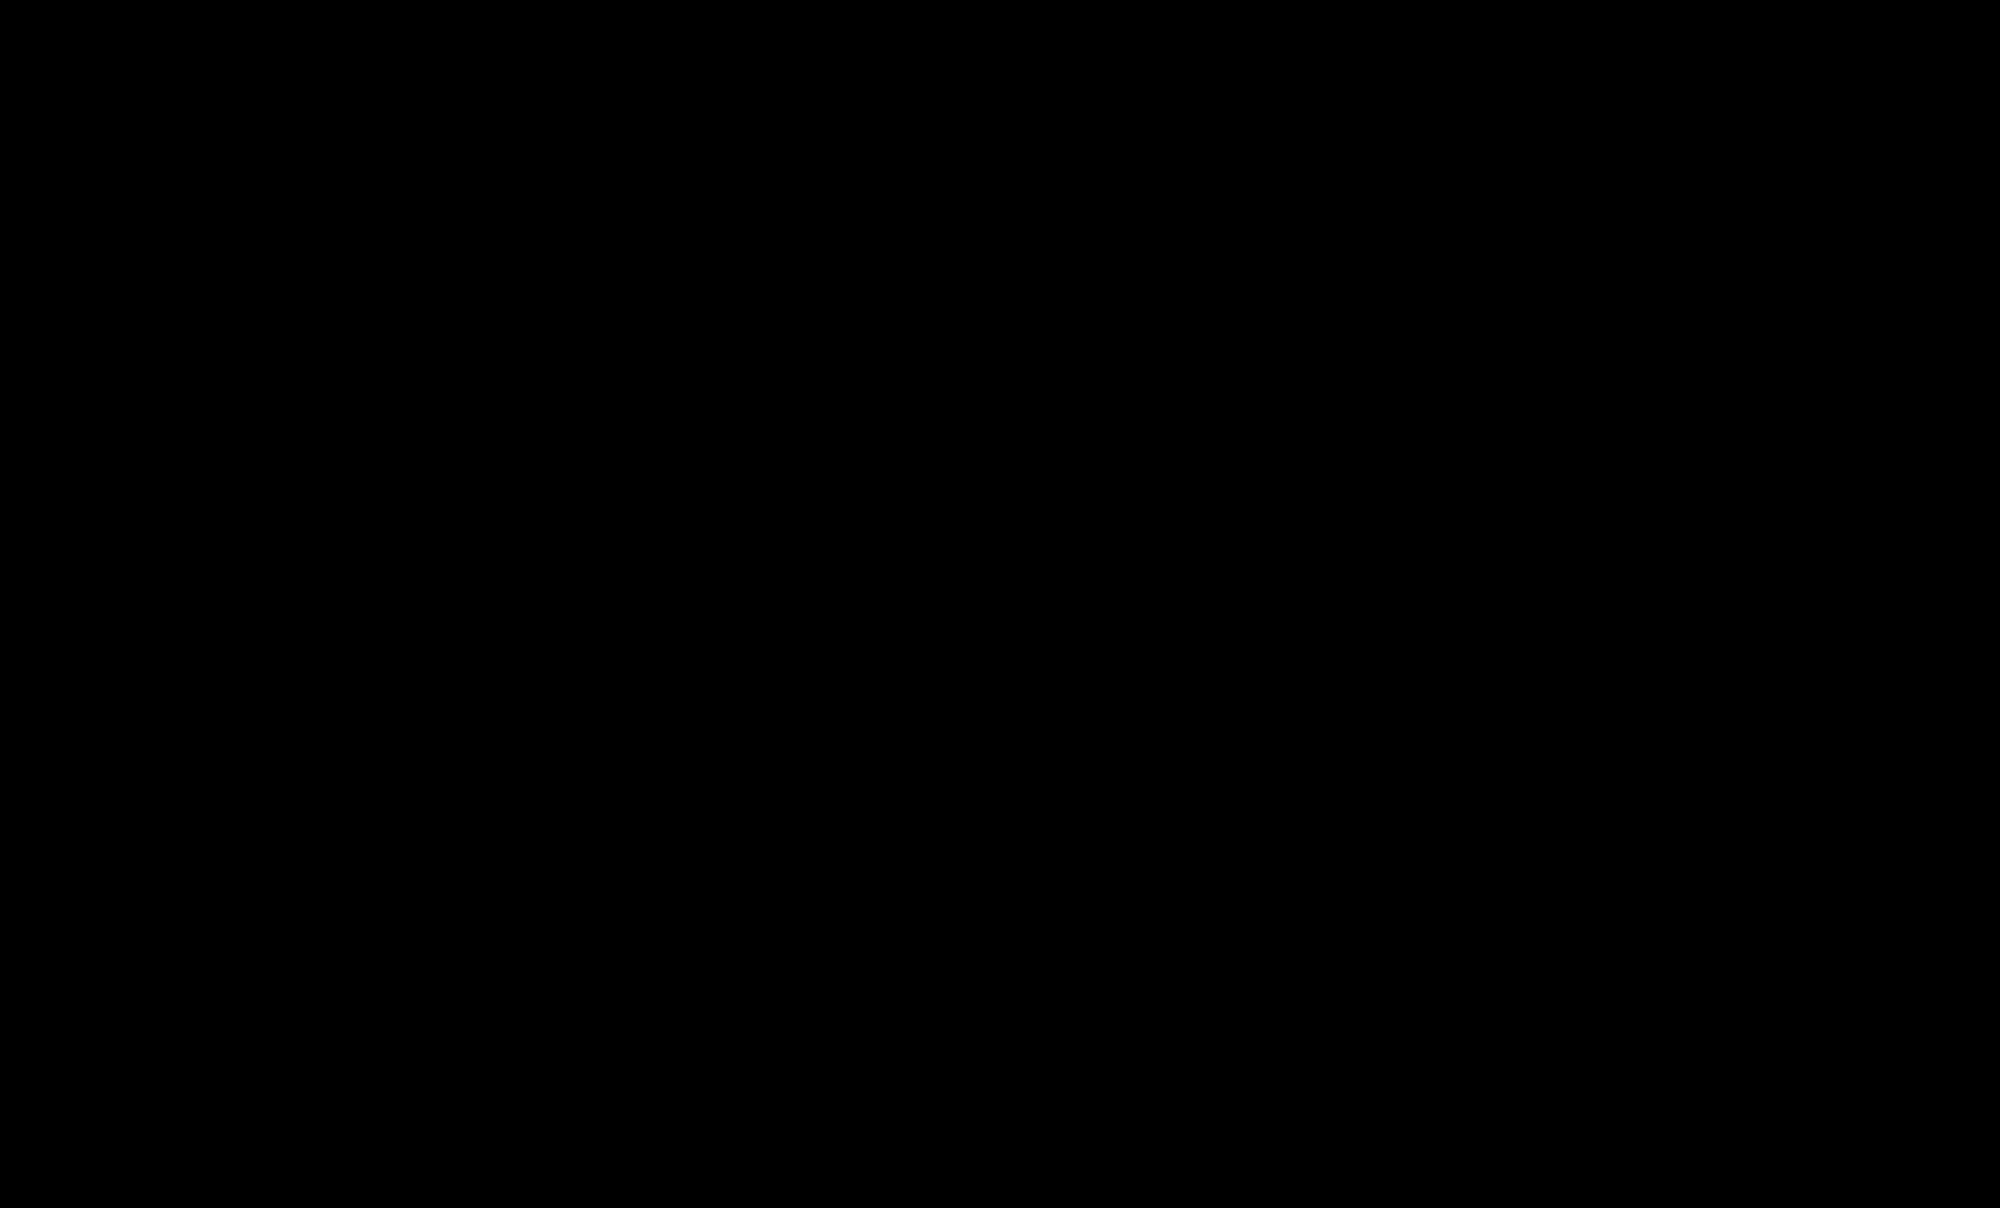 Daftar Channel TV Parabola Satelit Asiasat 3 – Channel TV Parabola